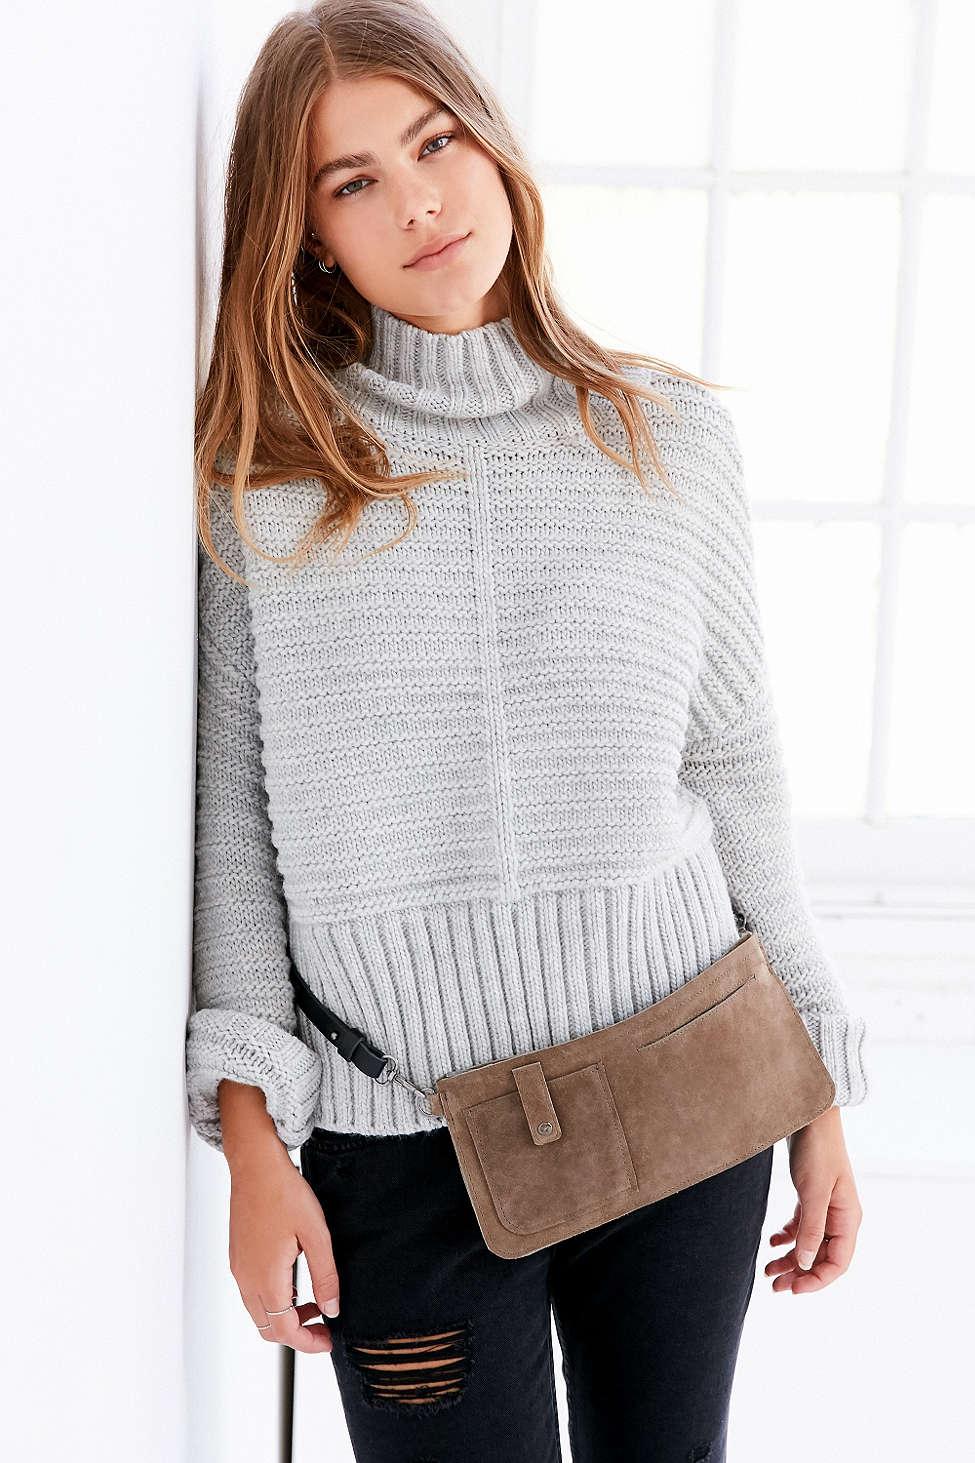 Kat Suede Sling Belt Bag. Urban Outfitters. $59.